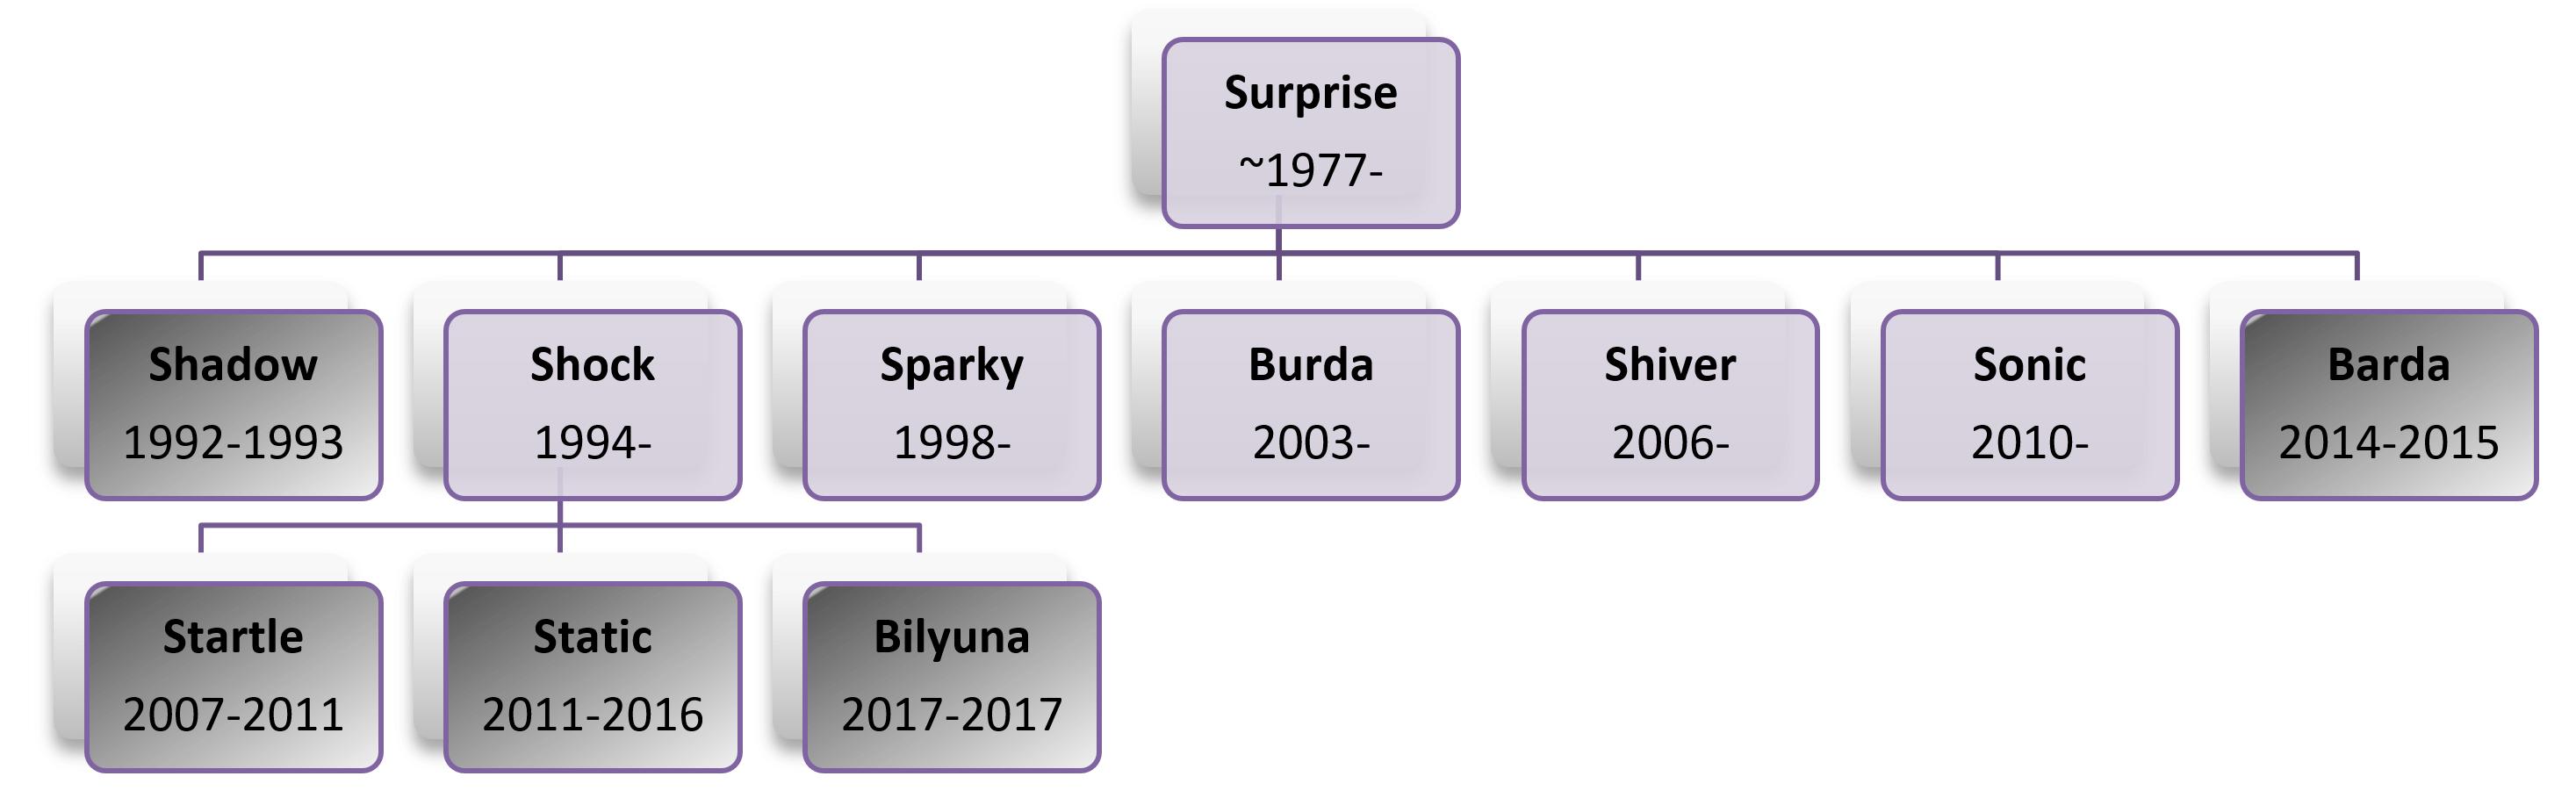 Surprise Lineage